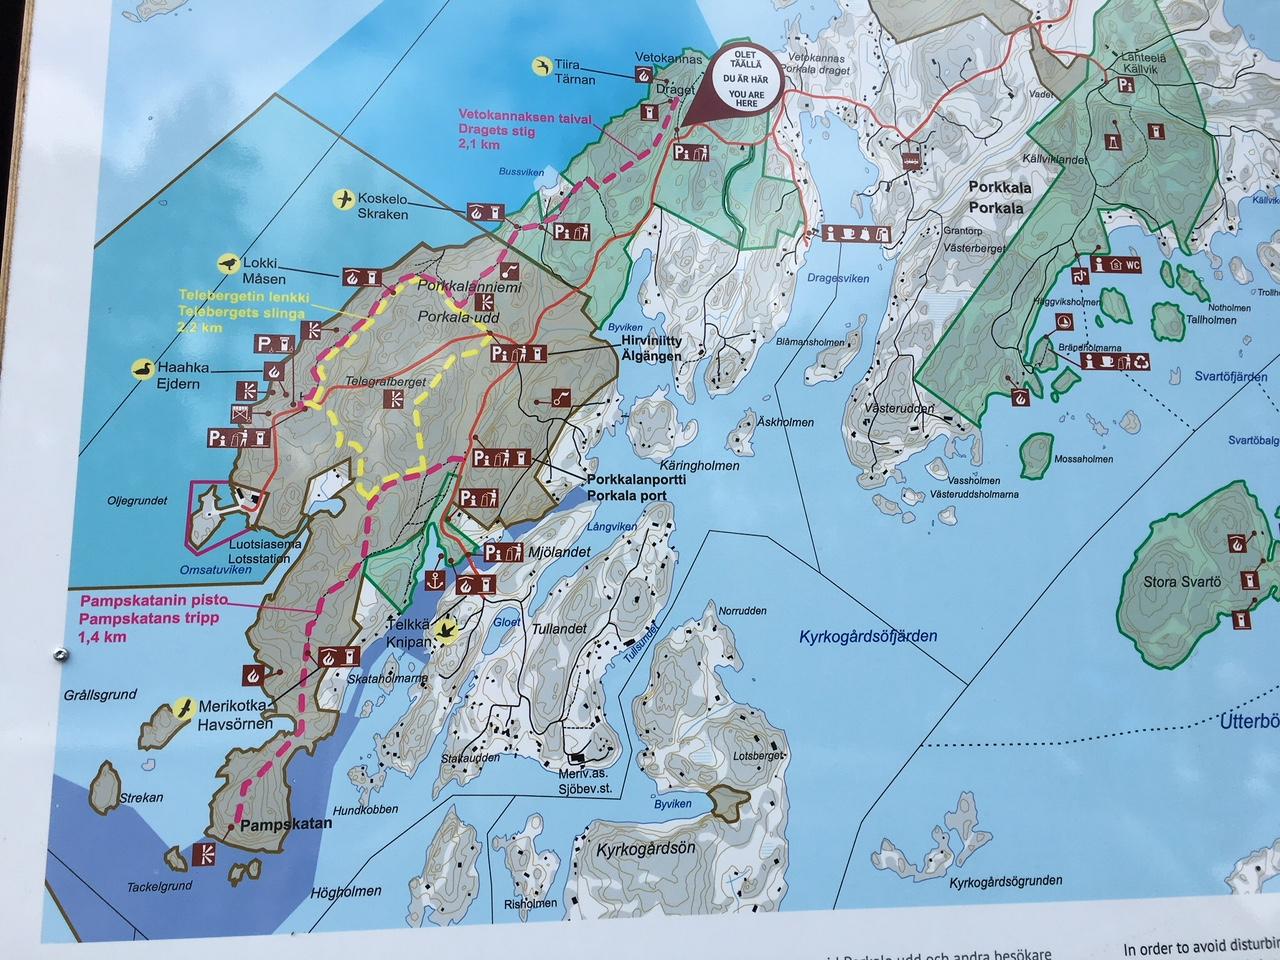 How to get to Porkkala